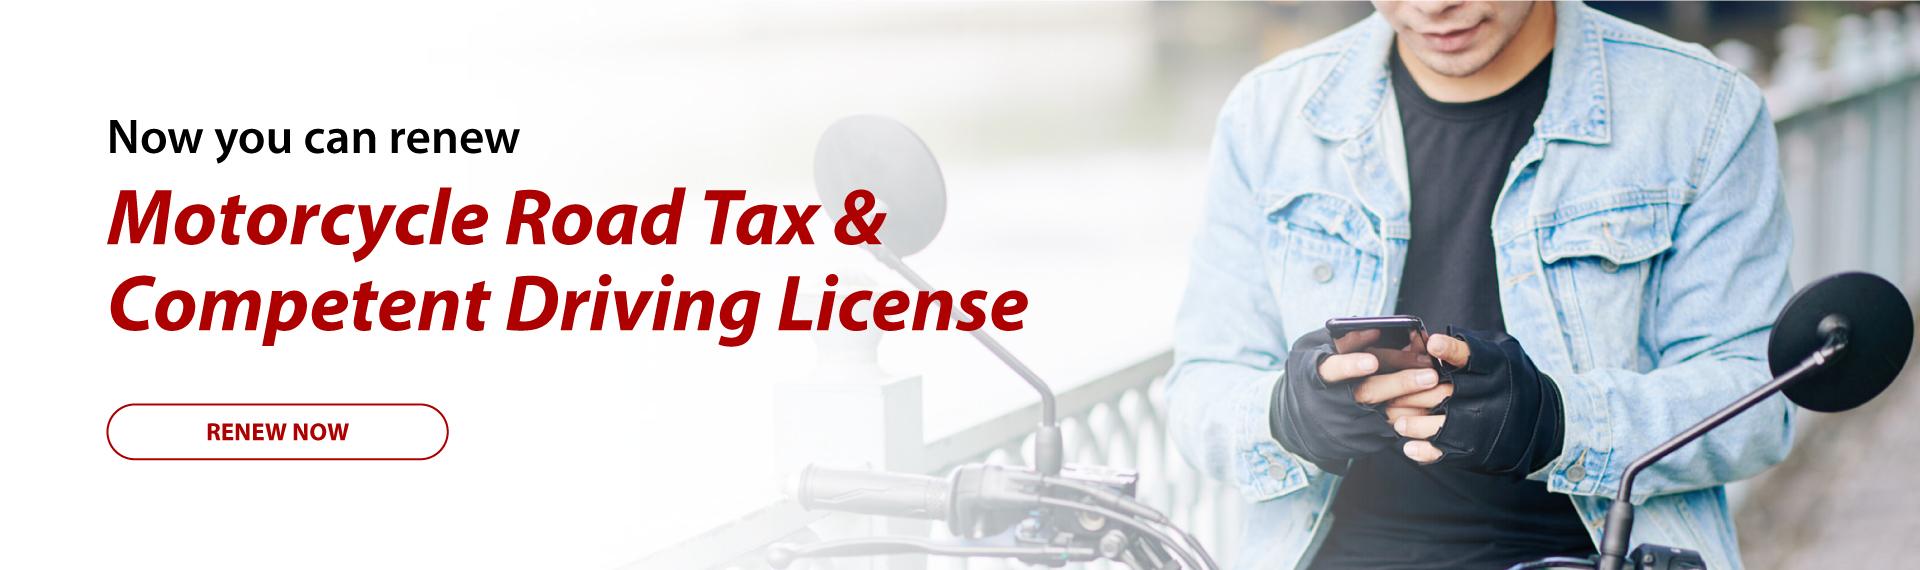 Car/Bike road tax & insurance renewal